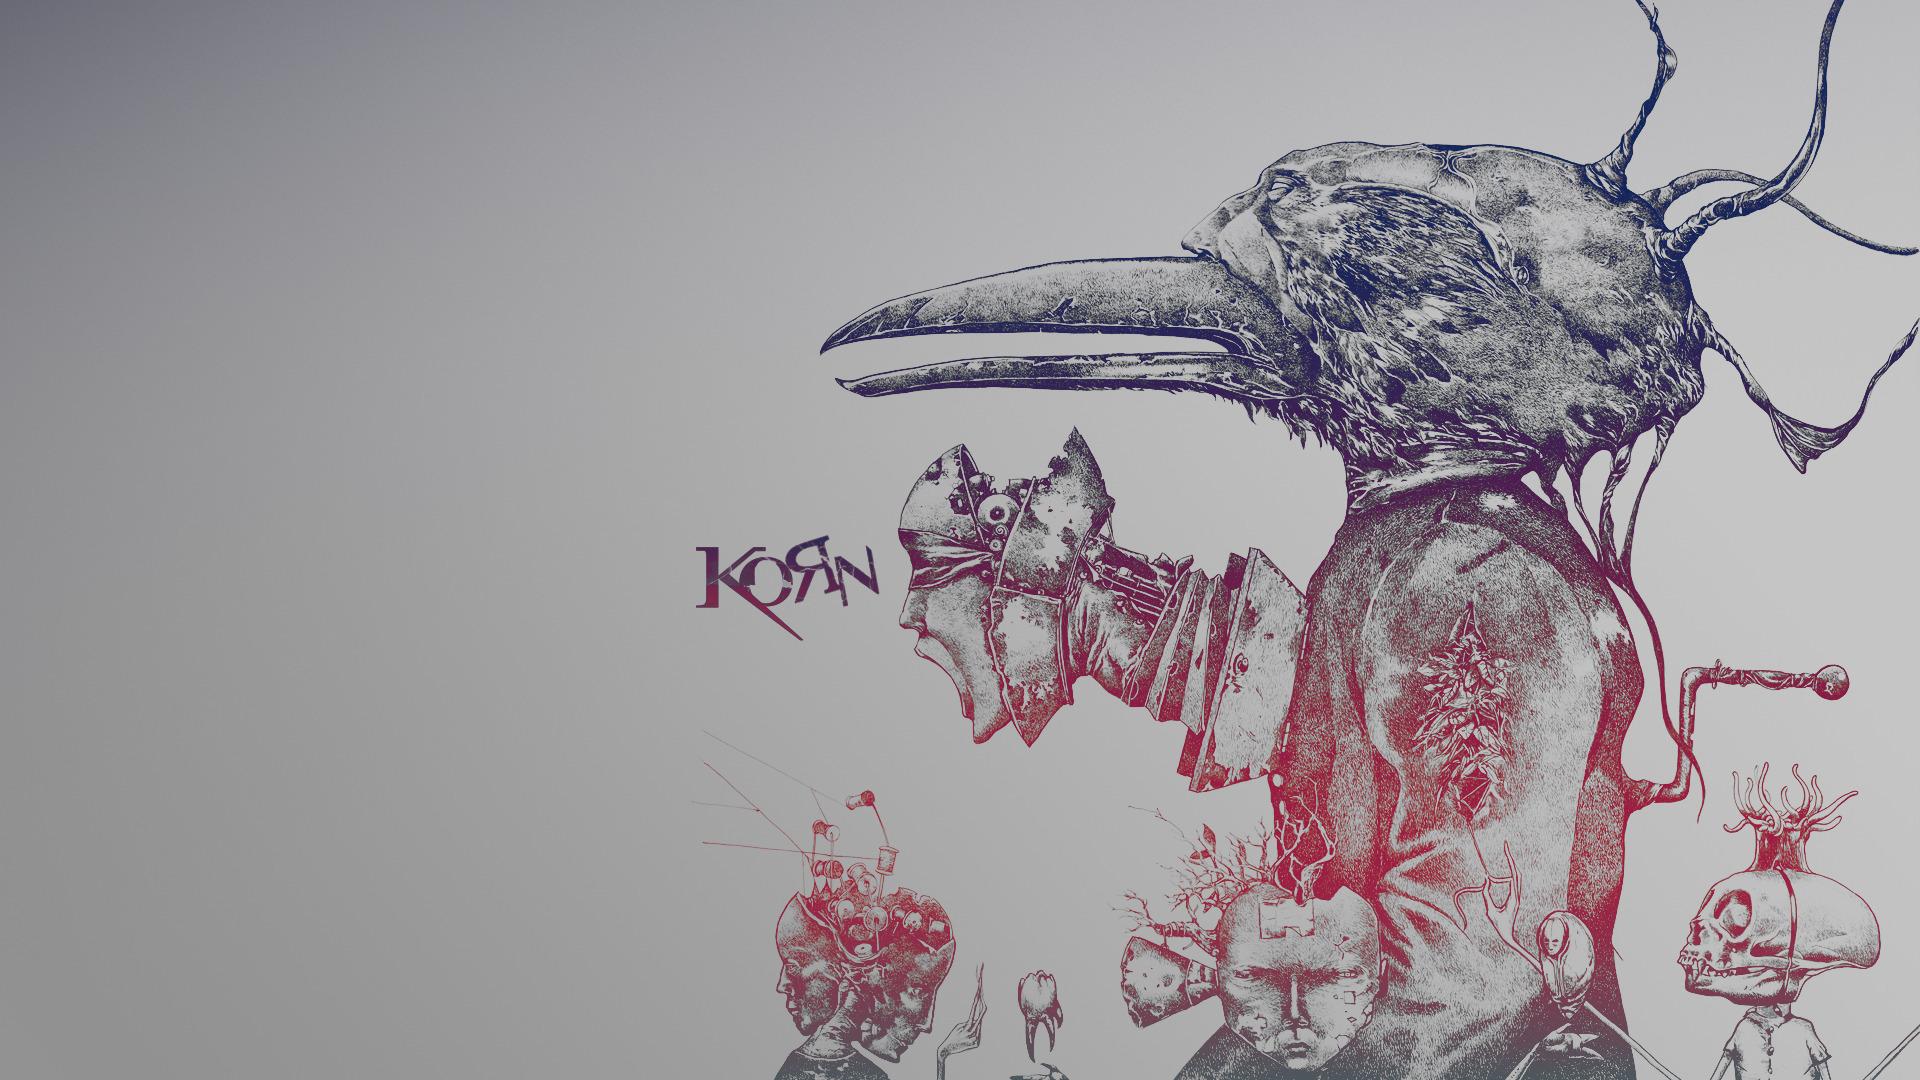 Hd Korn Wallpaper Iphone